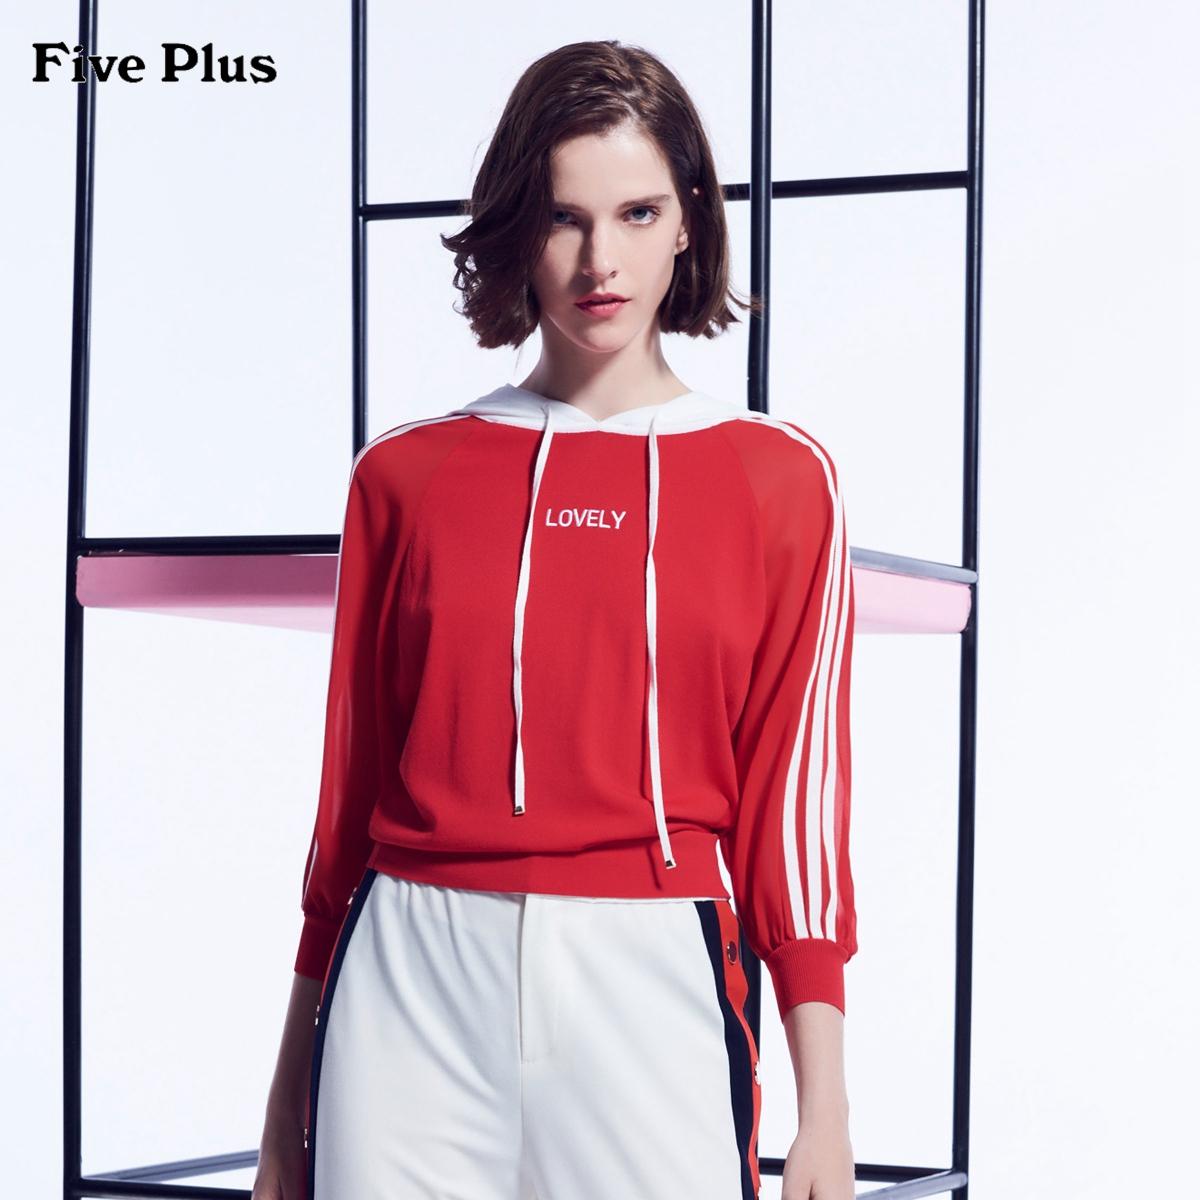 Five Plus2018新品女夏装宽松卫衣款女连帽套头针织衫拼接条纹潮